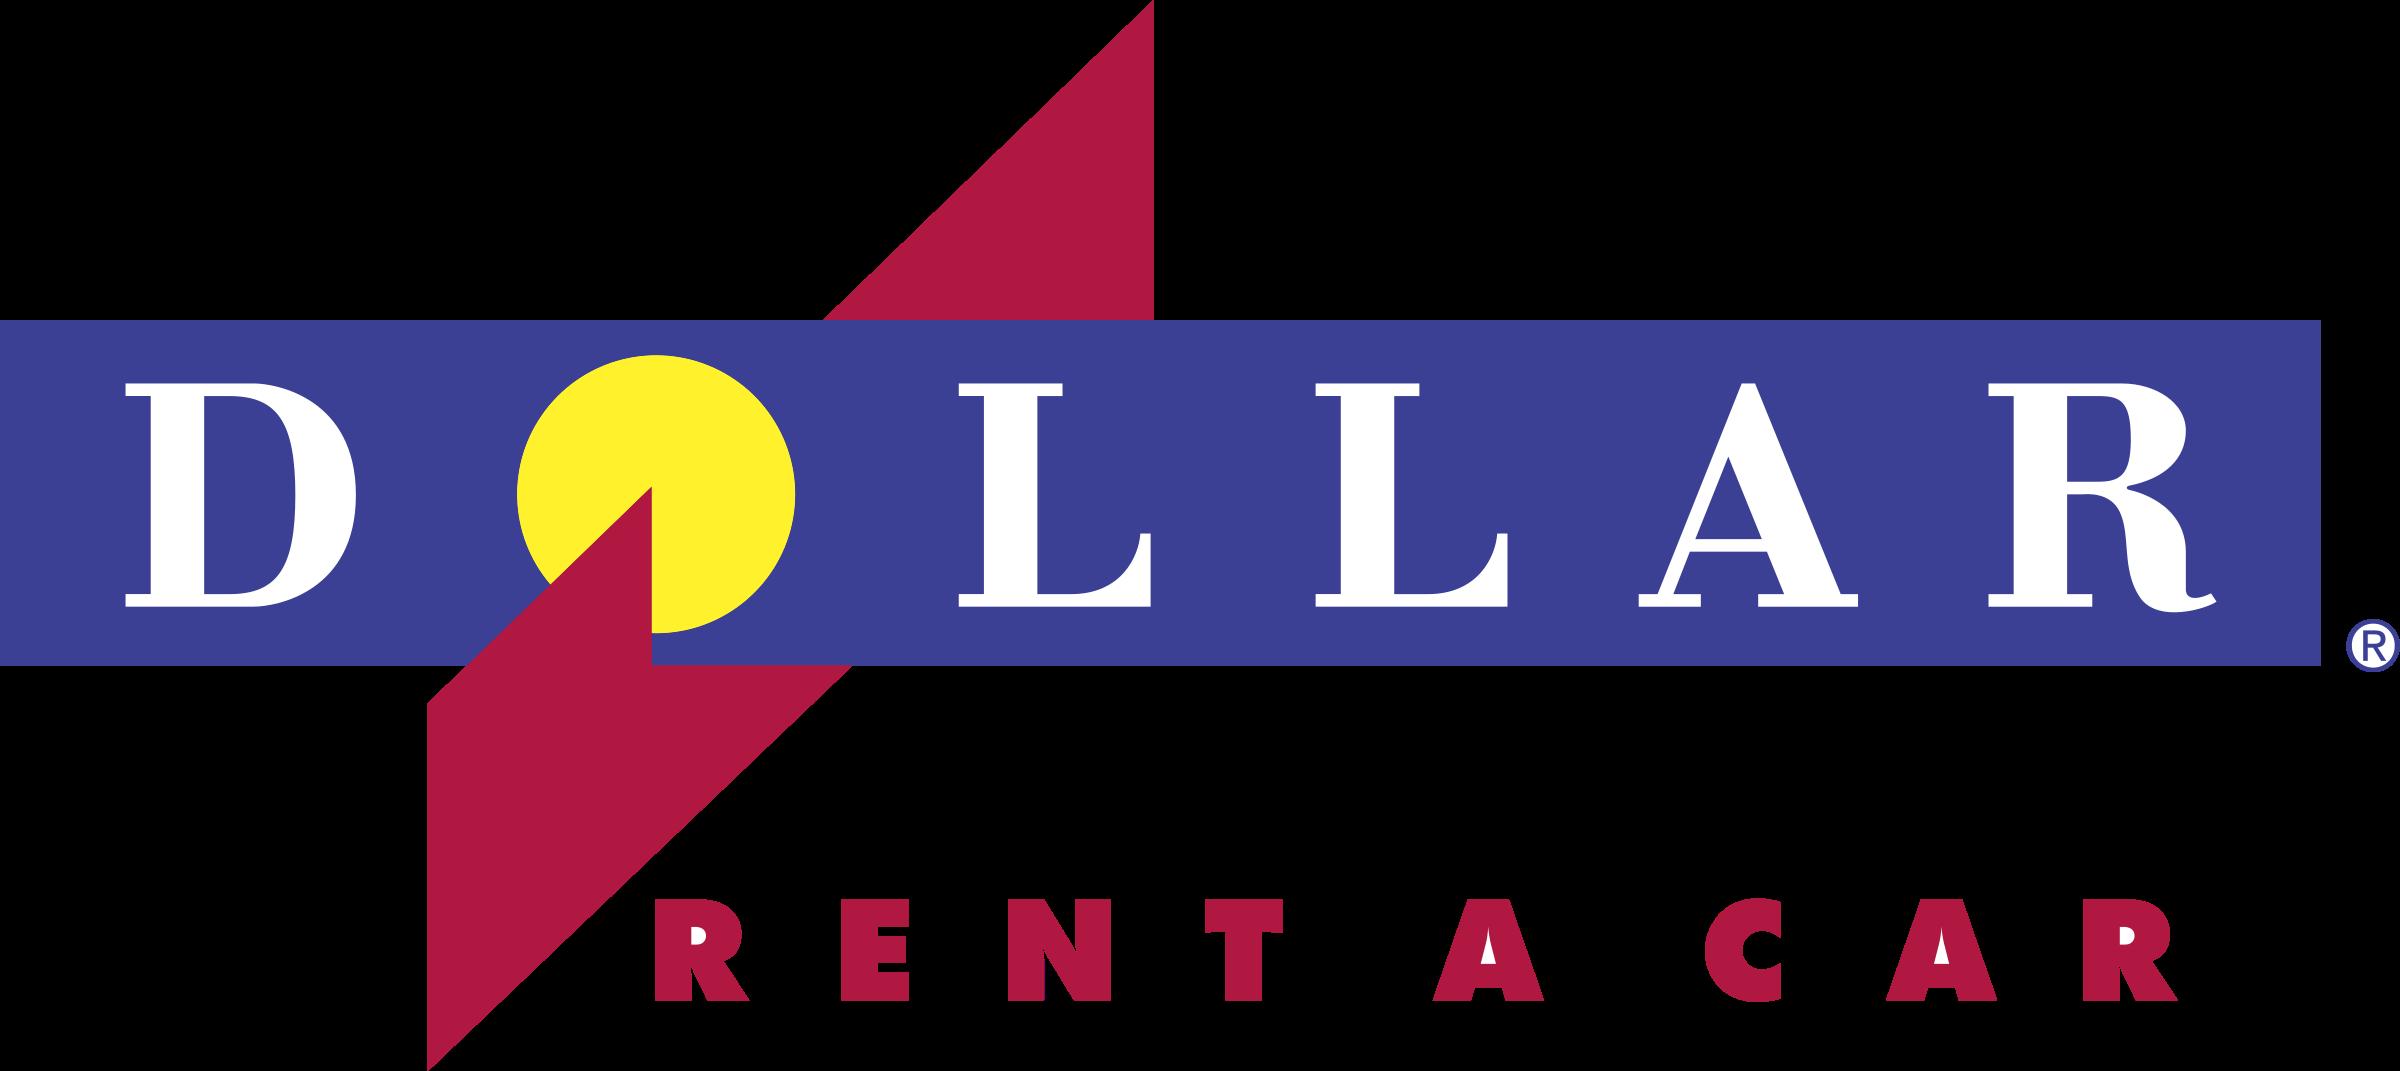 Dollar Rent-a-Car, Inc. cashback offer